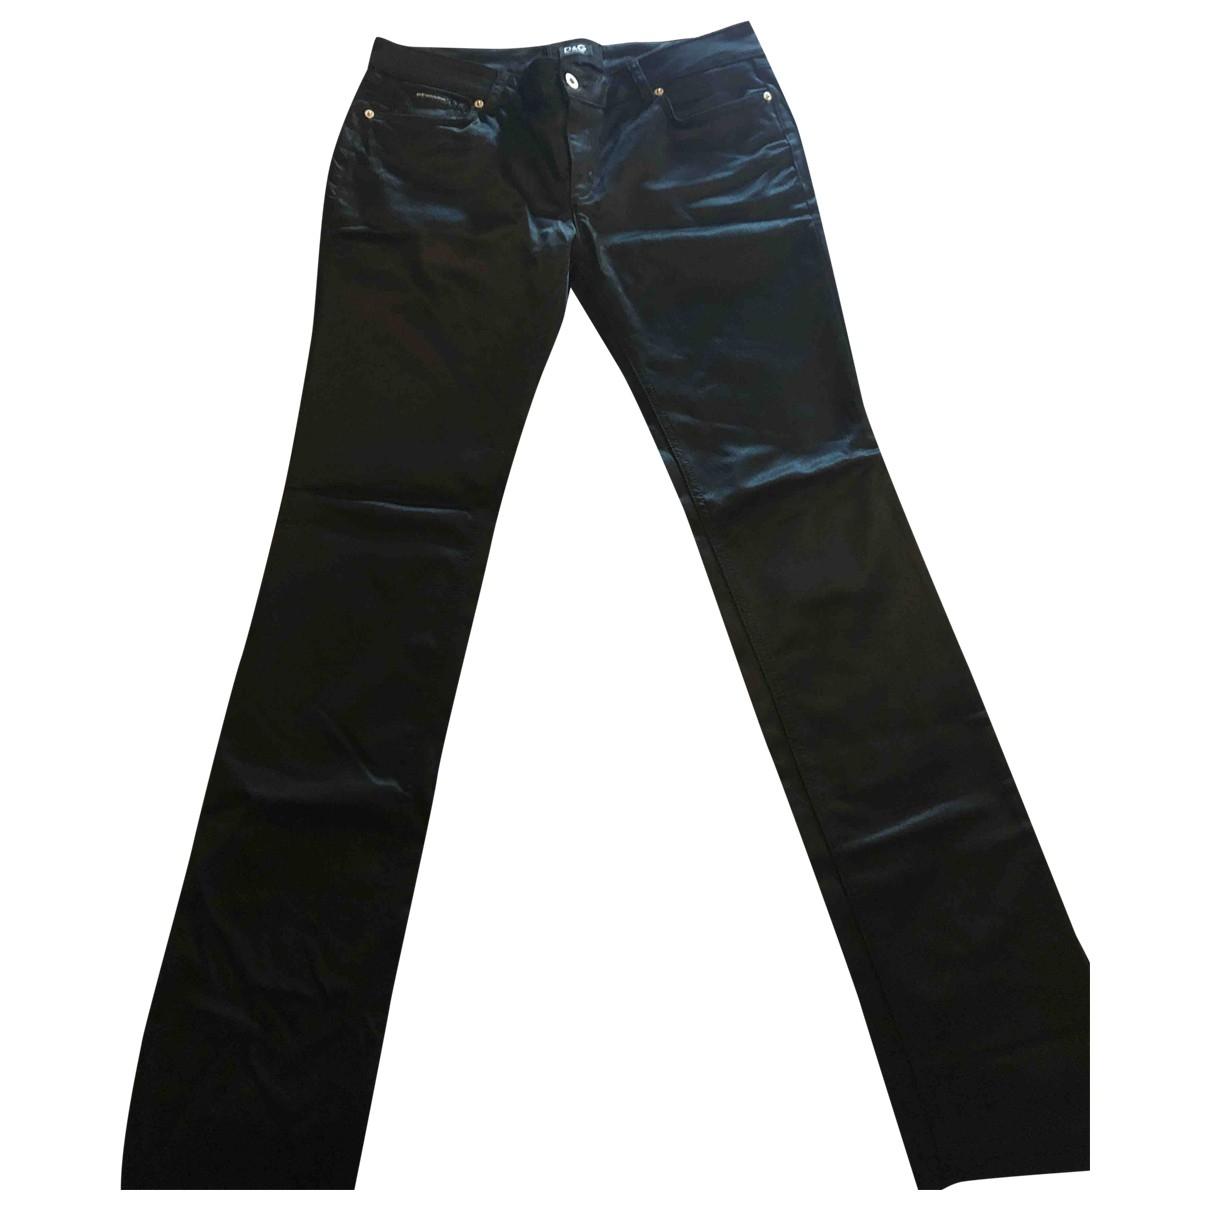 D&g \N Black Cotton Trousers for Women 46 IT